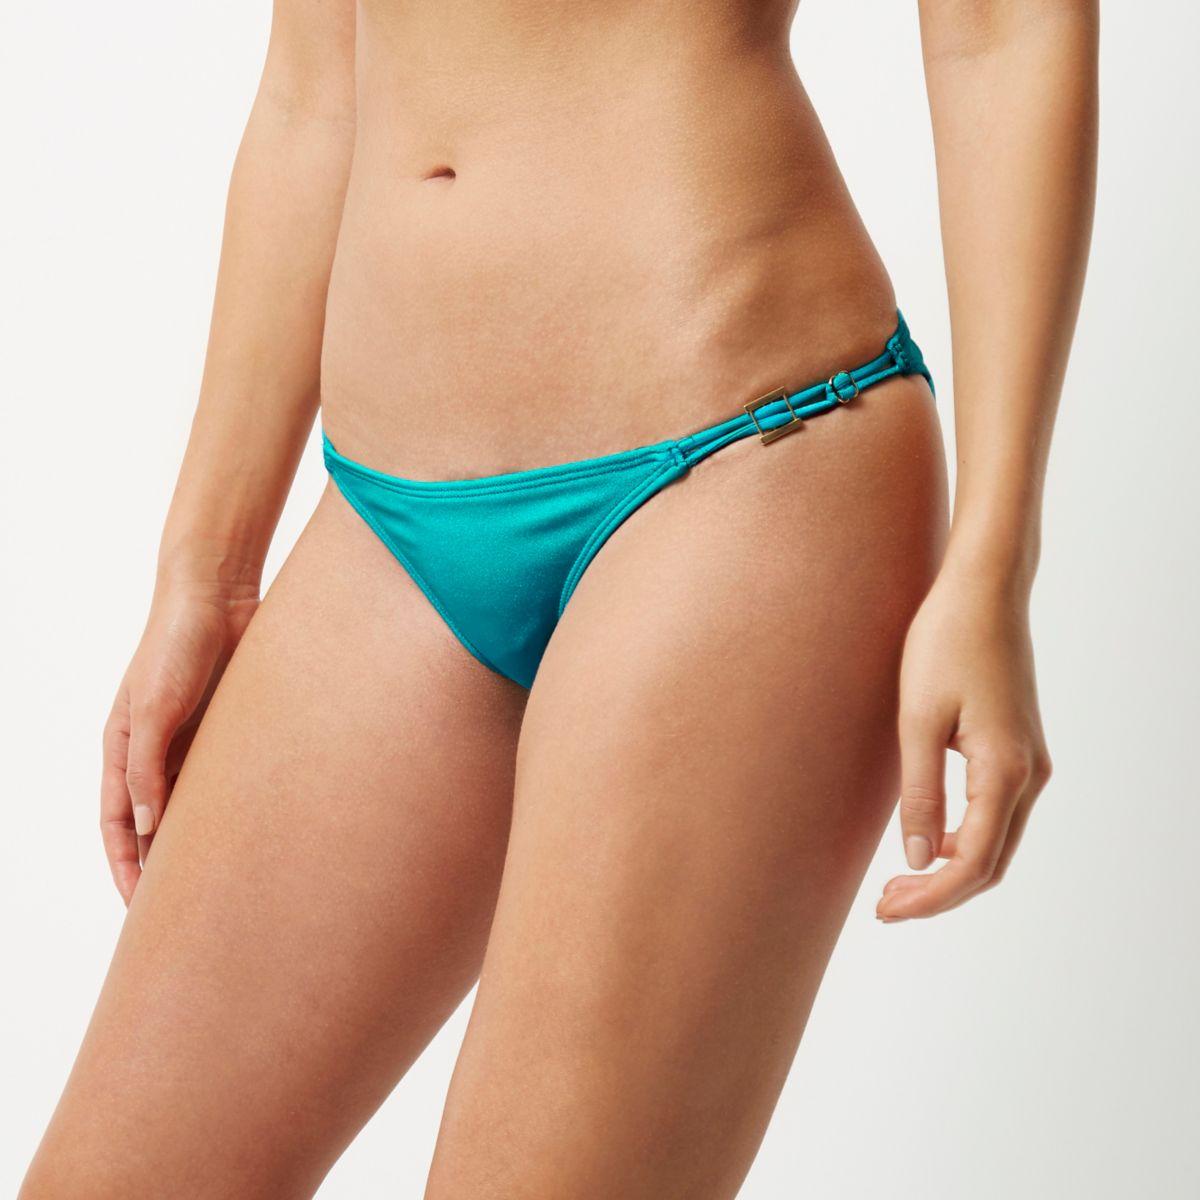 Wonder how bikini bottoms sale